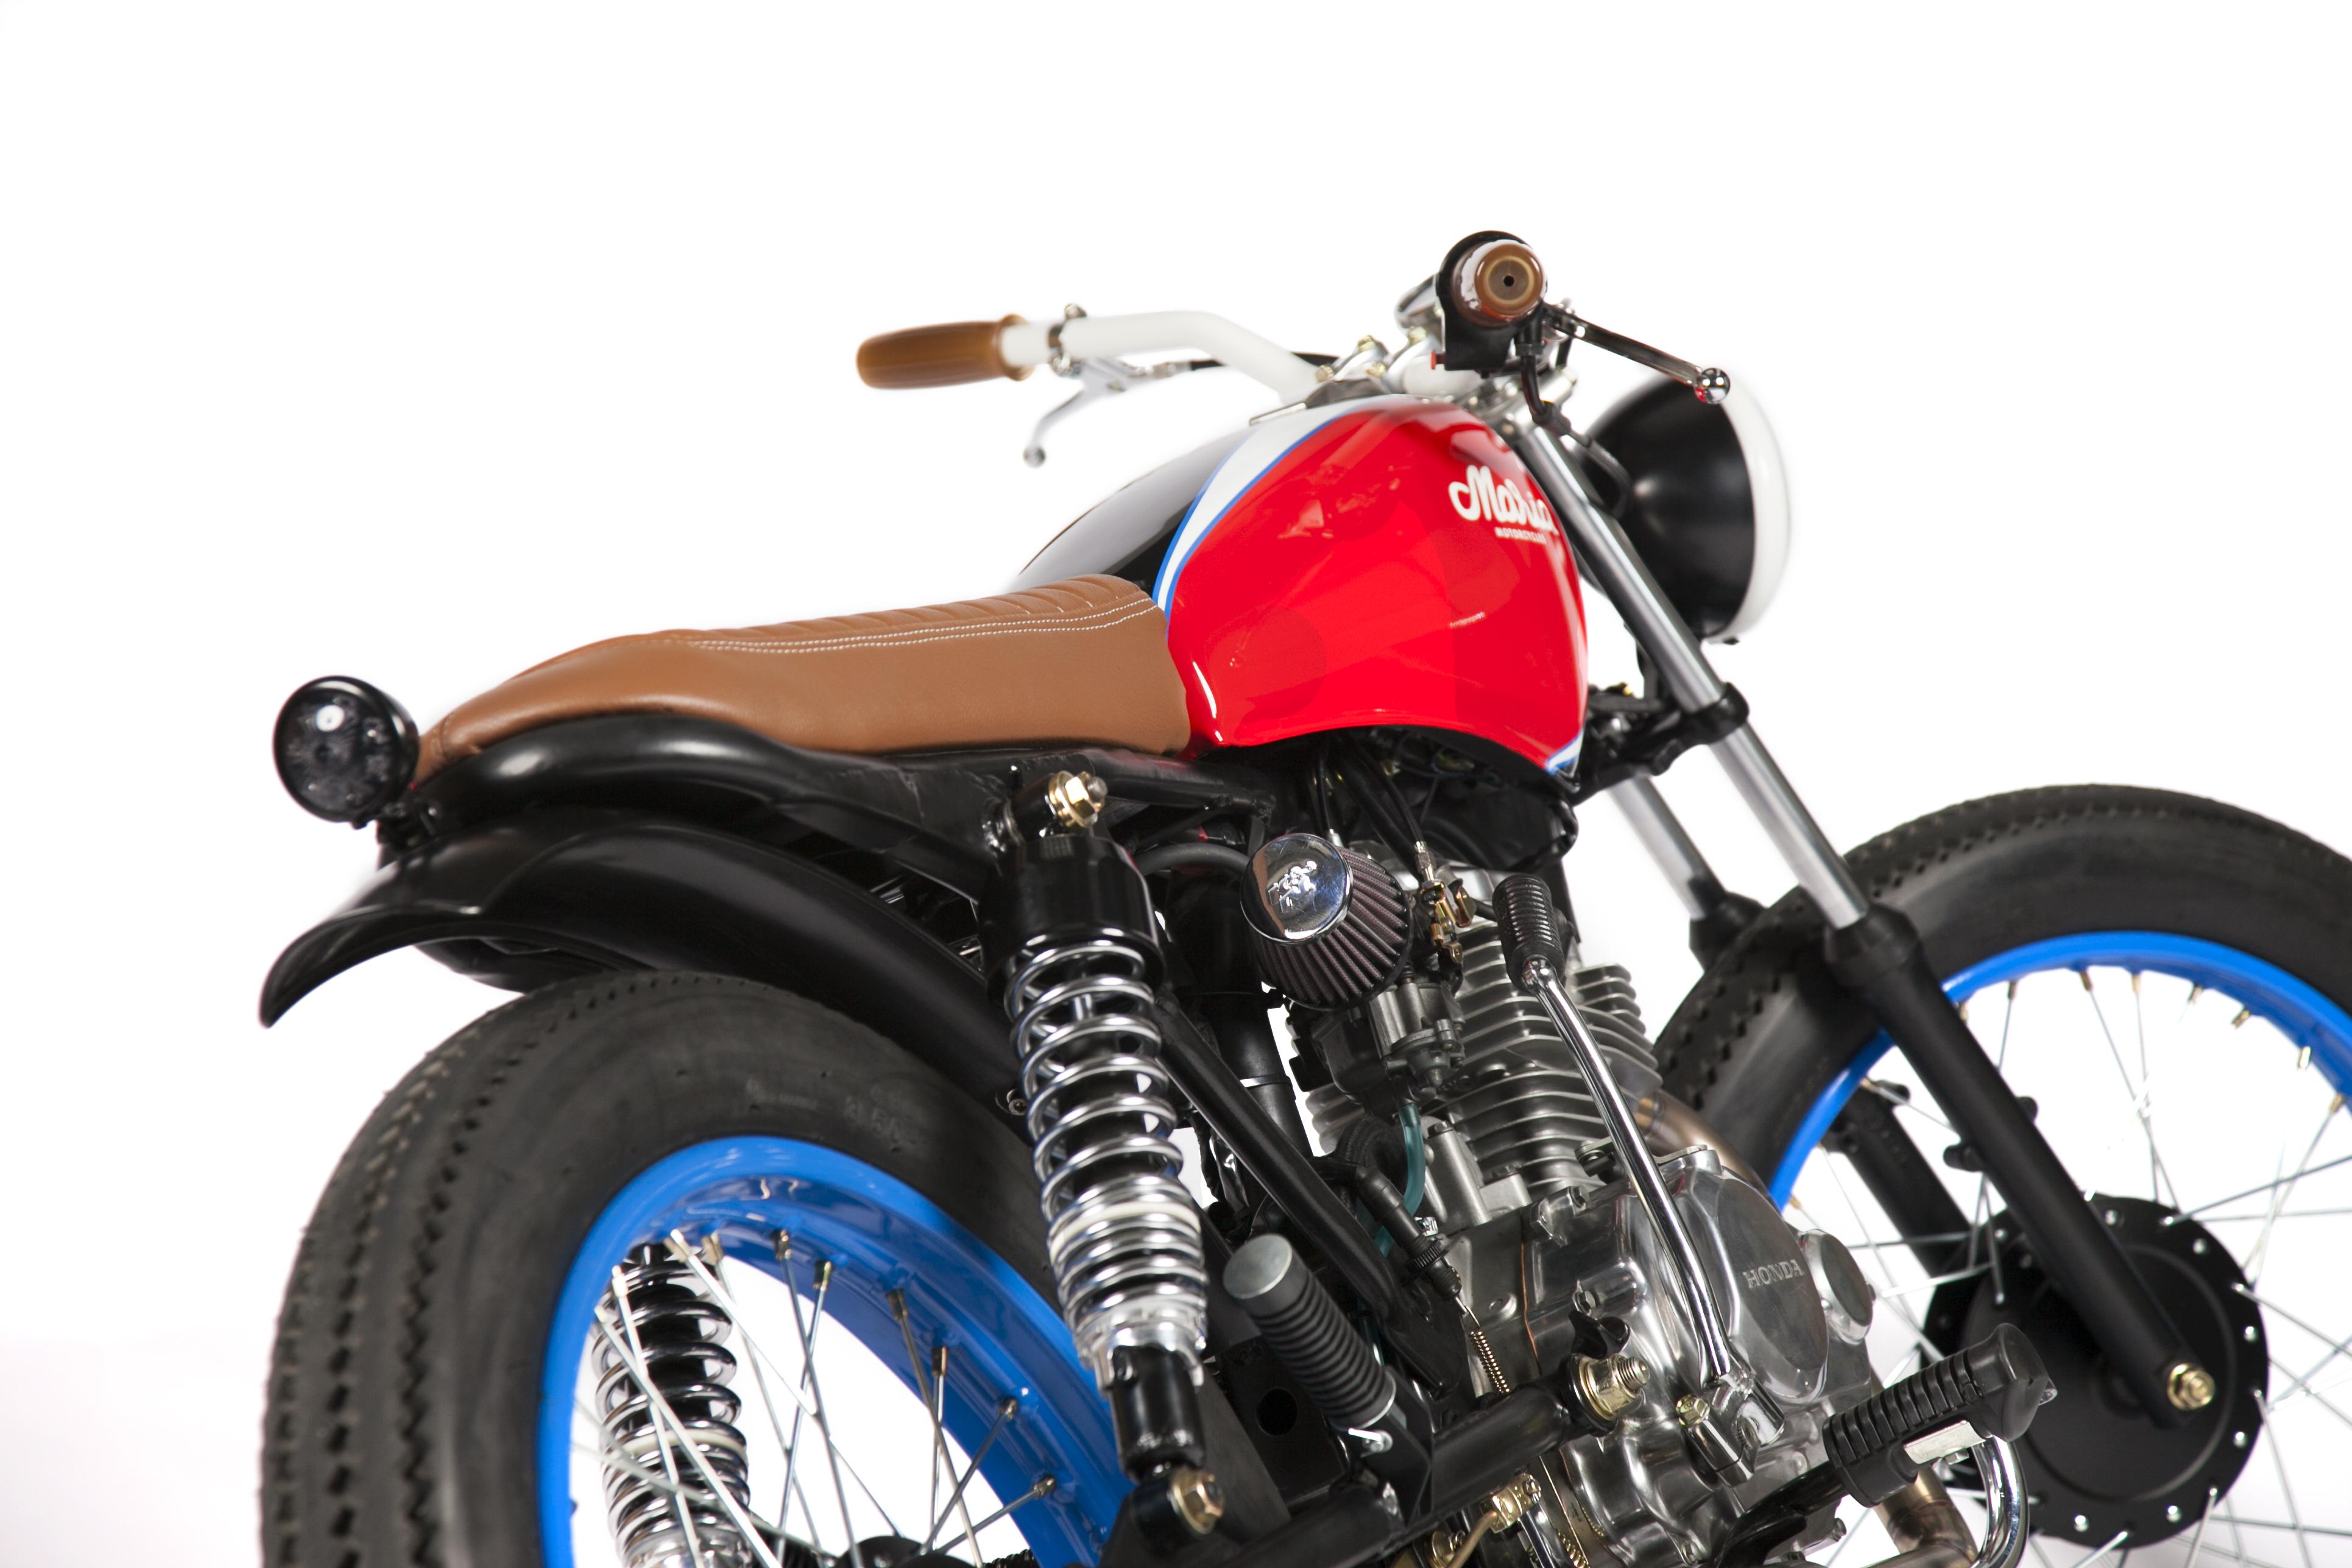 maria_motorcycles_honda_cg125_beladonna_3847